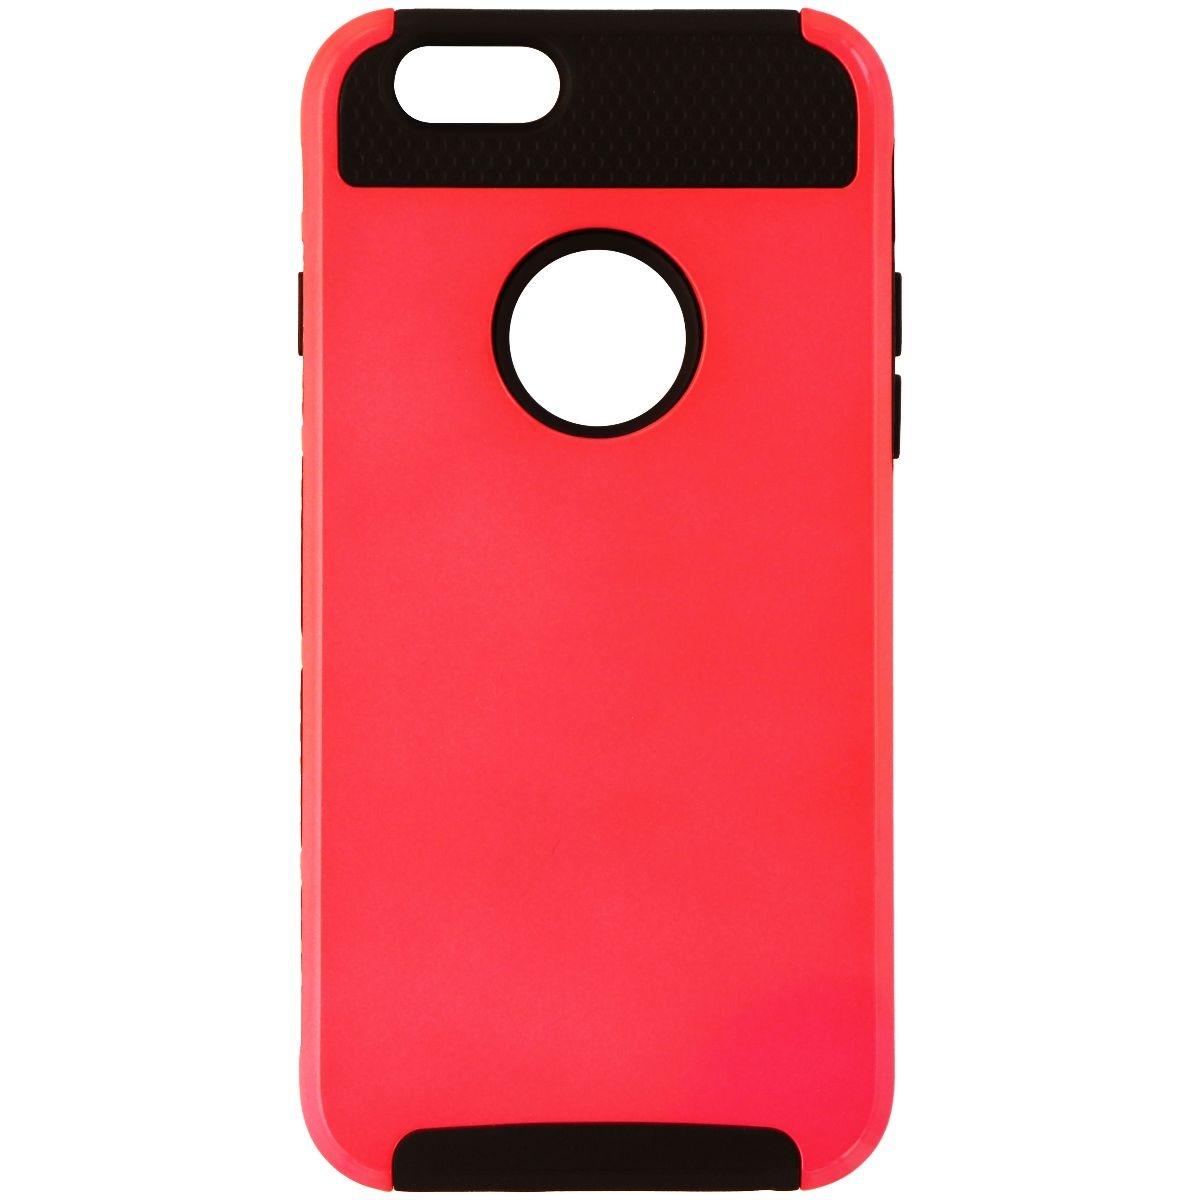 Nimbus9 Series Dual Layer Grip Case for Apple iPhone 6s / 6 - Pink/Black